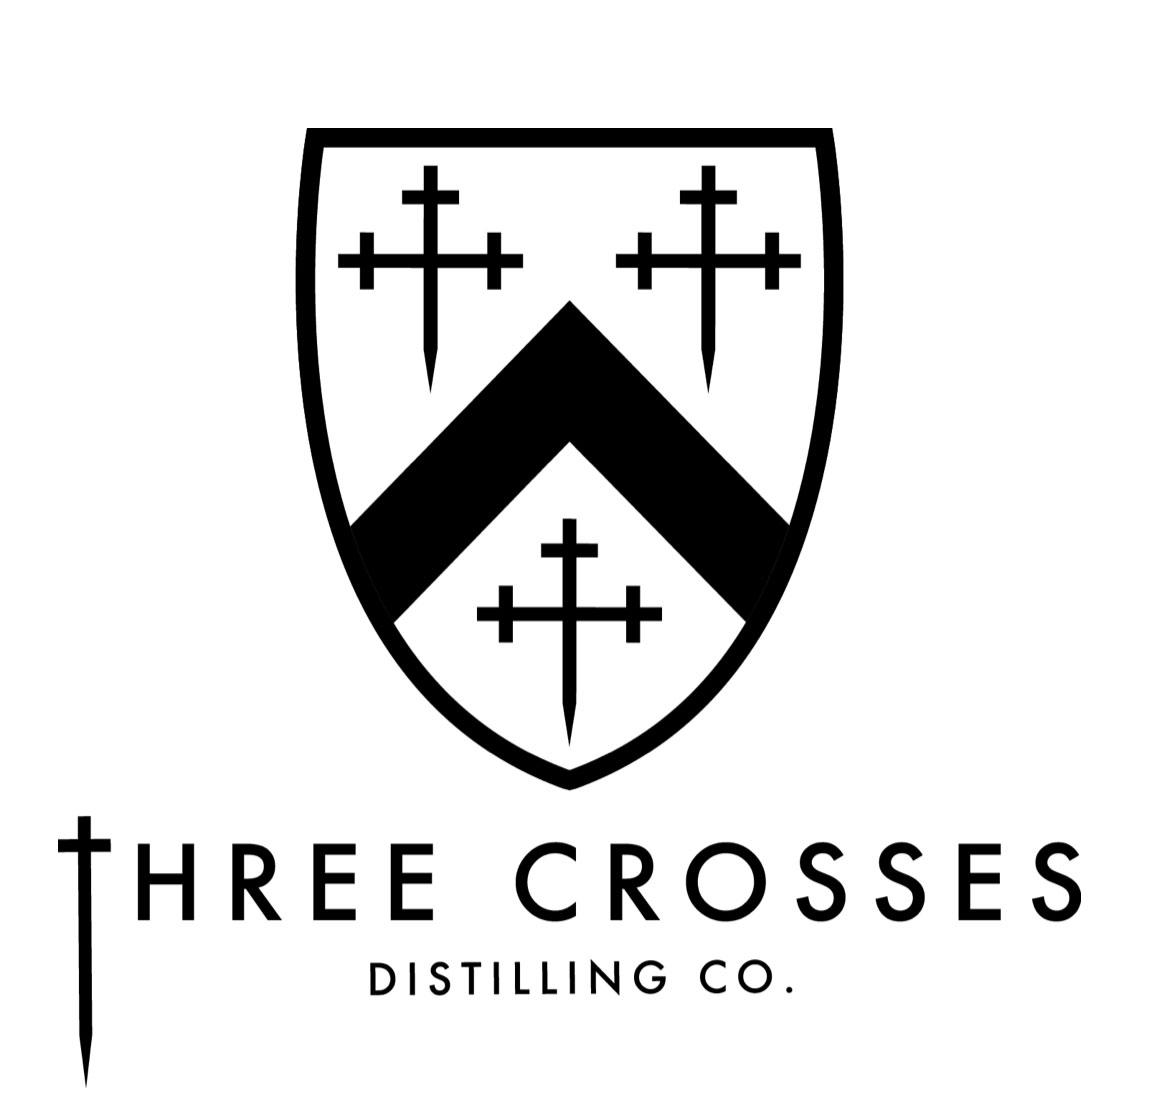 Three.Crosses.Distilling.Co_Logo_BW.jpg